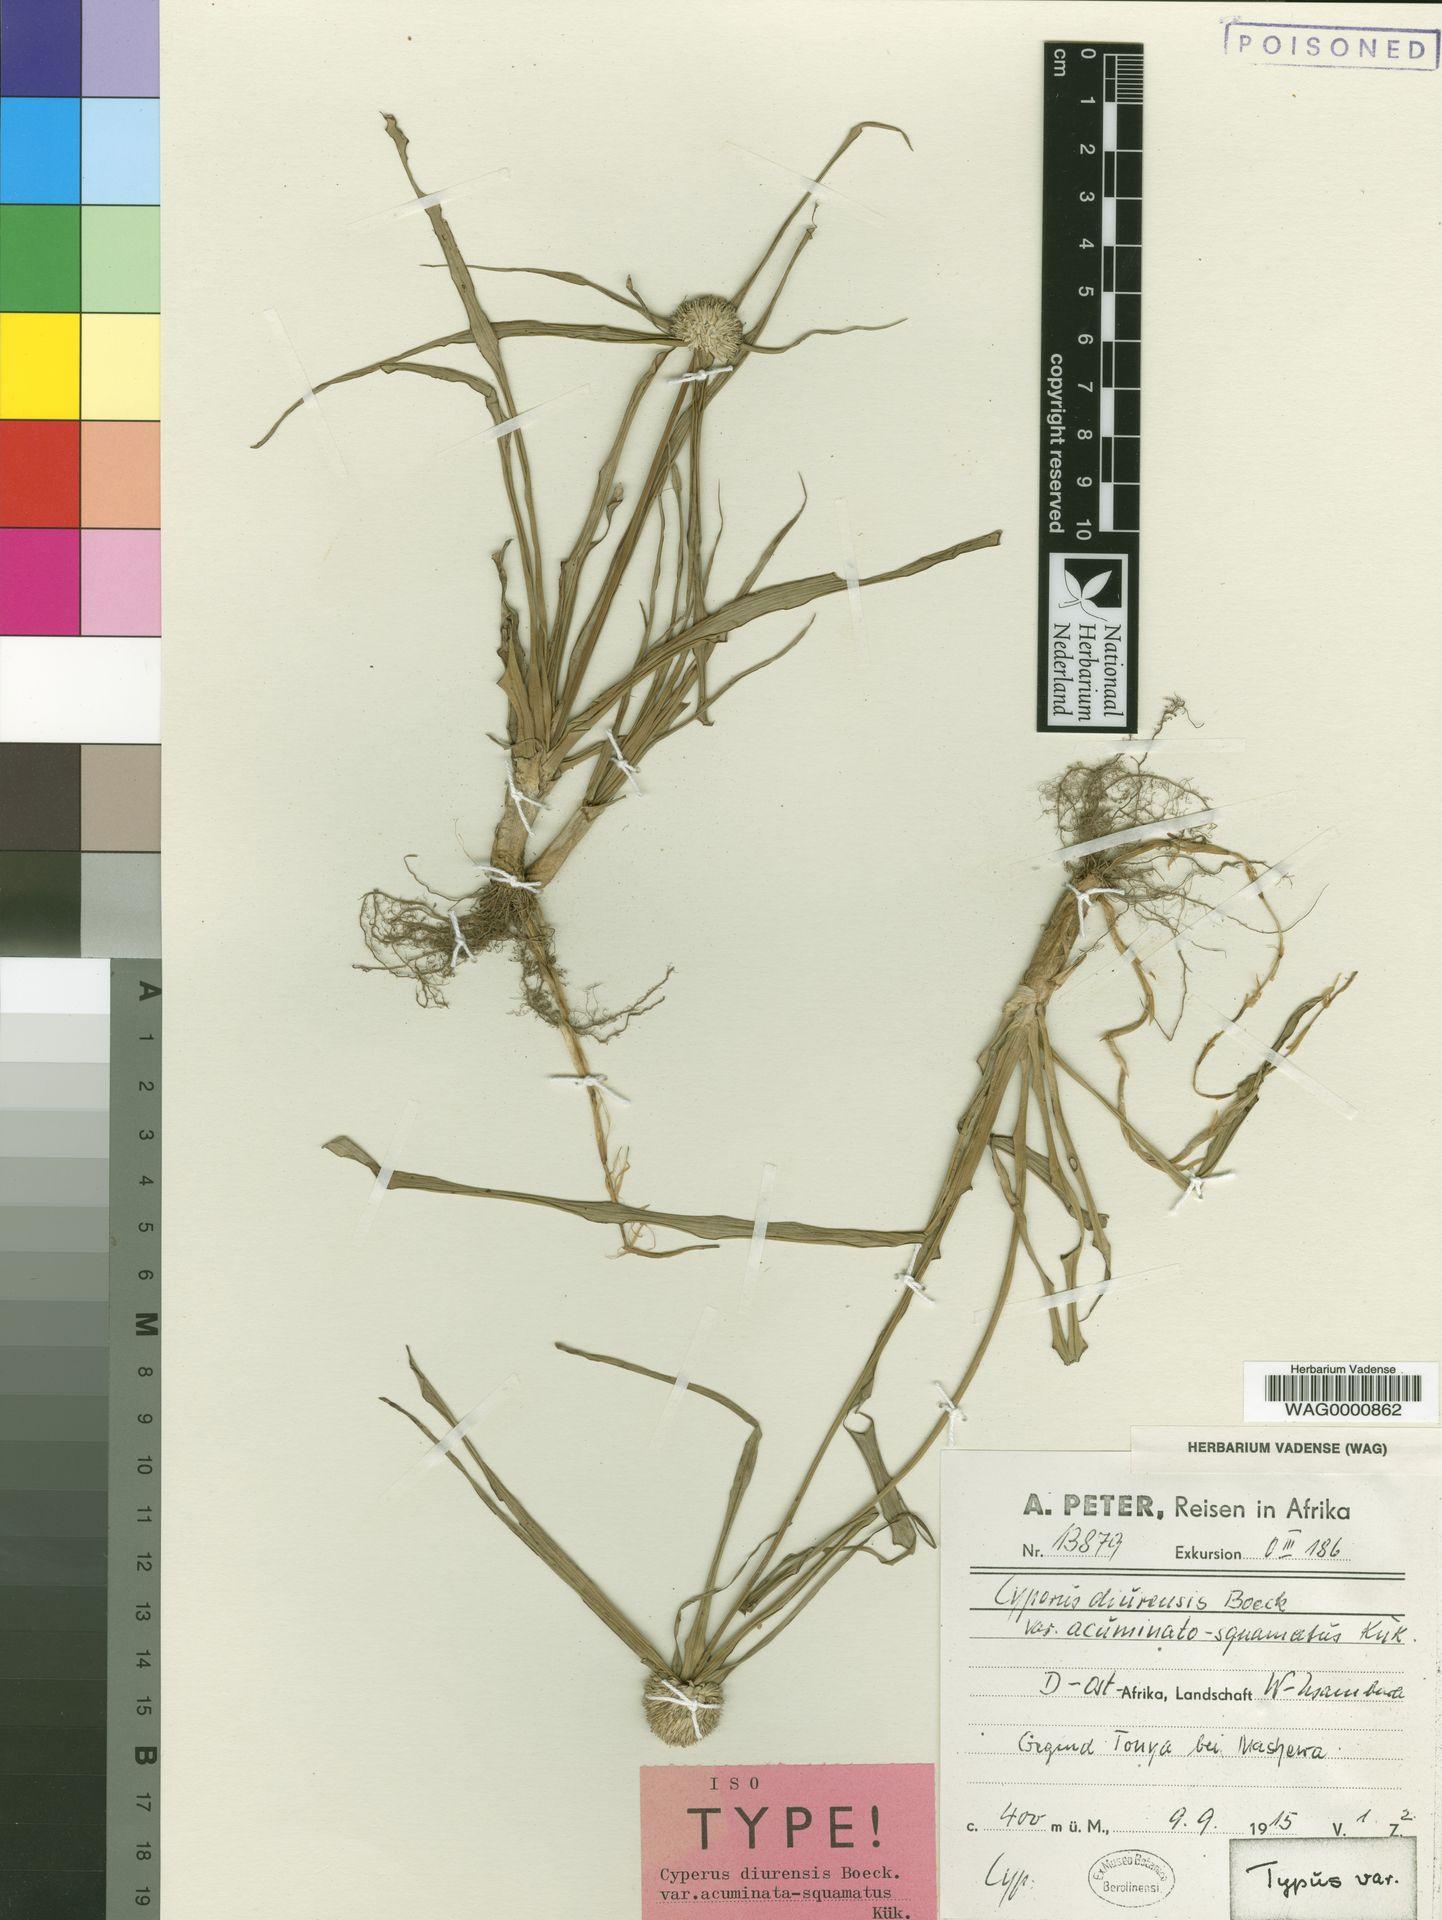 WAG.1770417 | Cyperus diurensis var. acuminato-squamatus Kük.